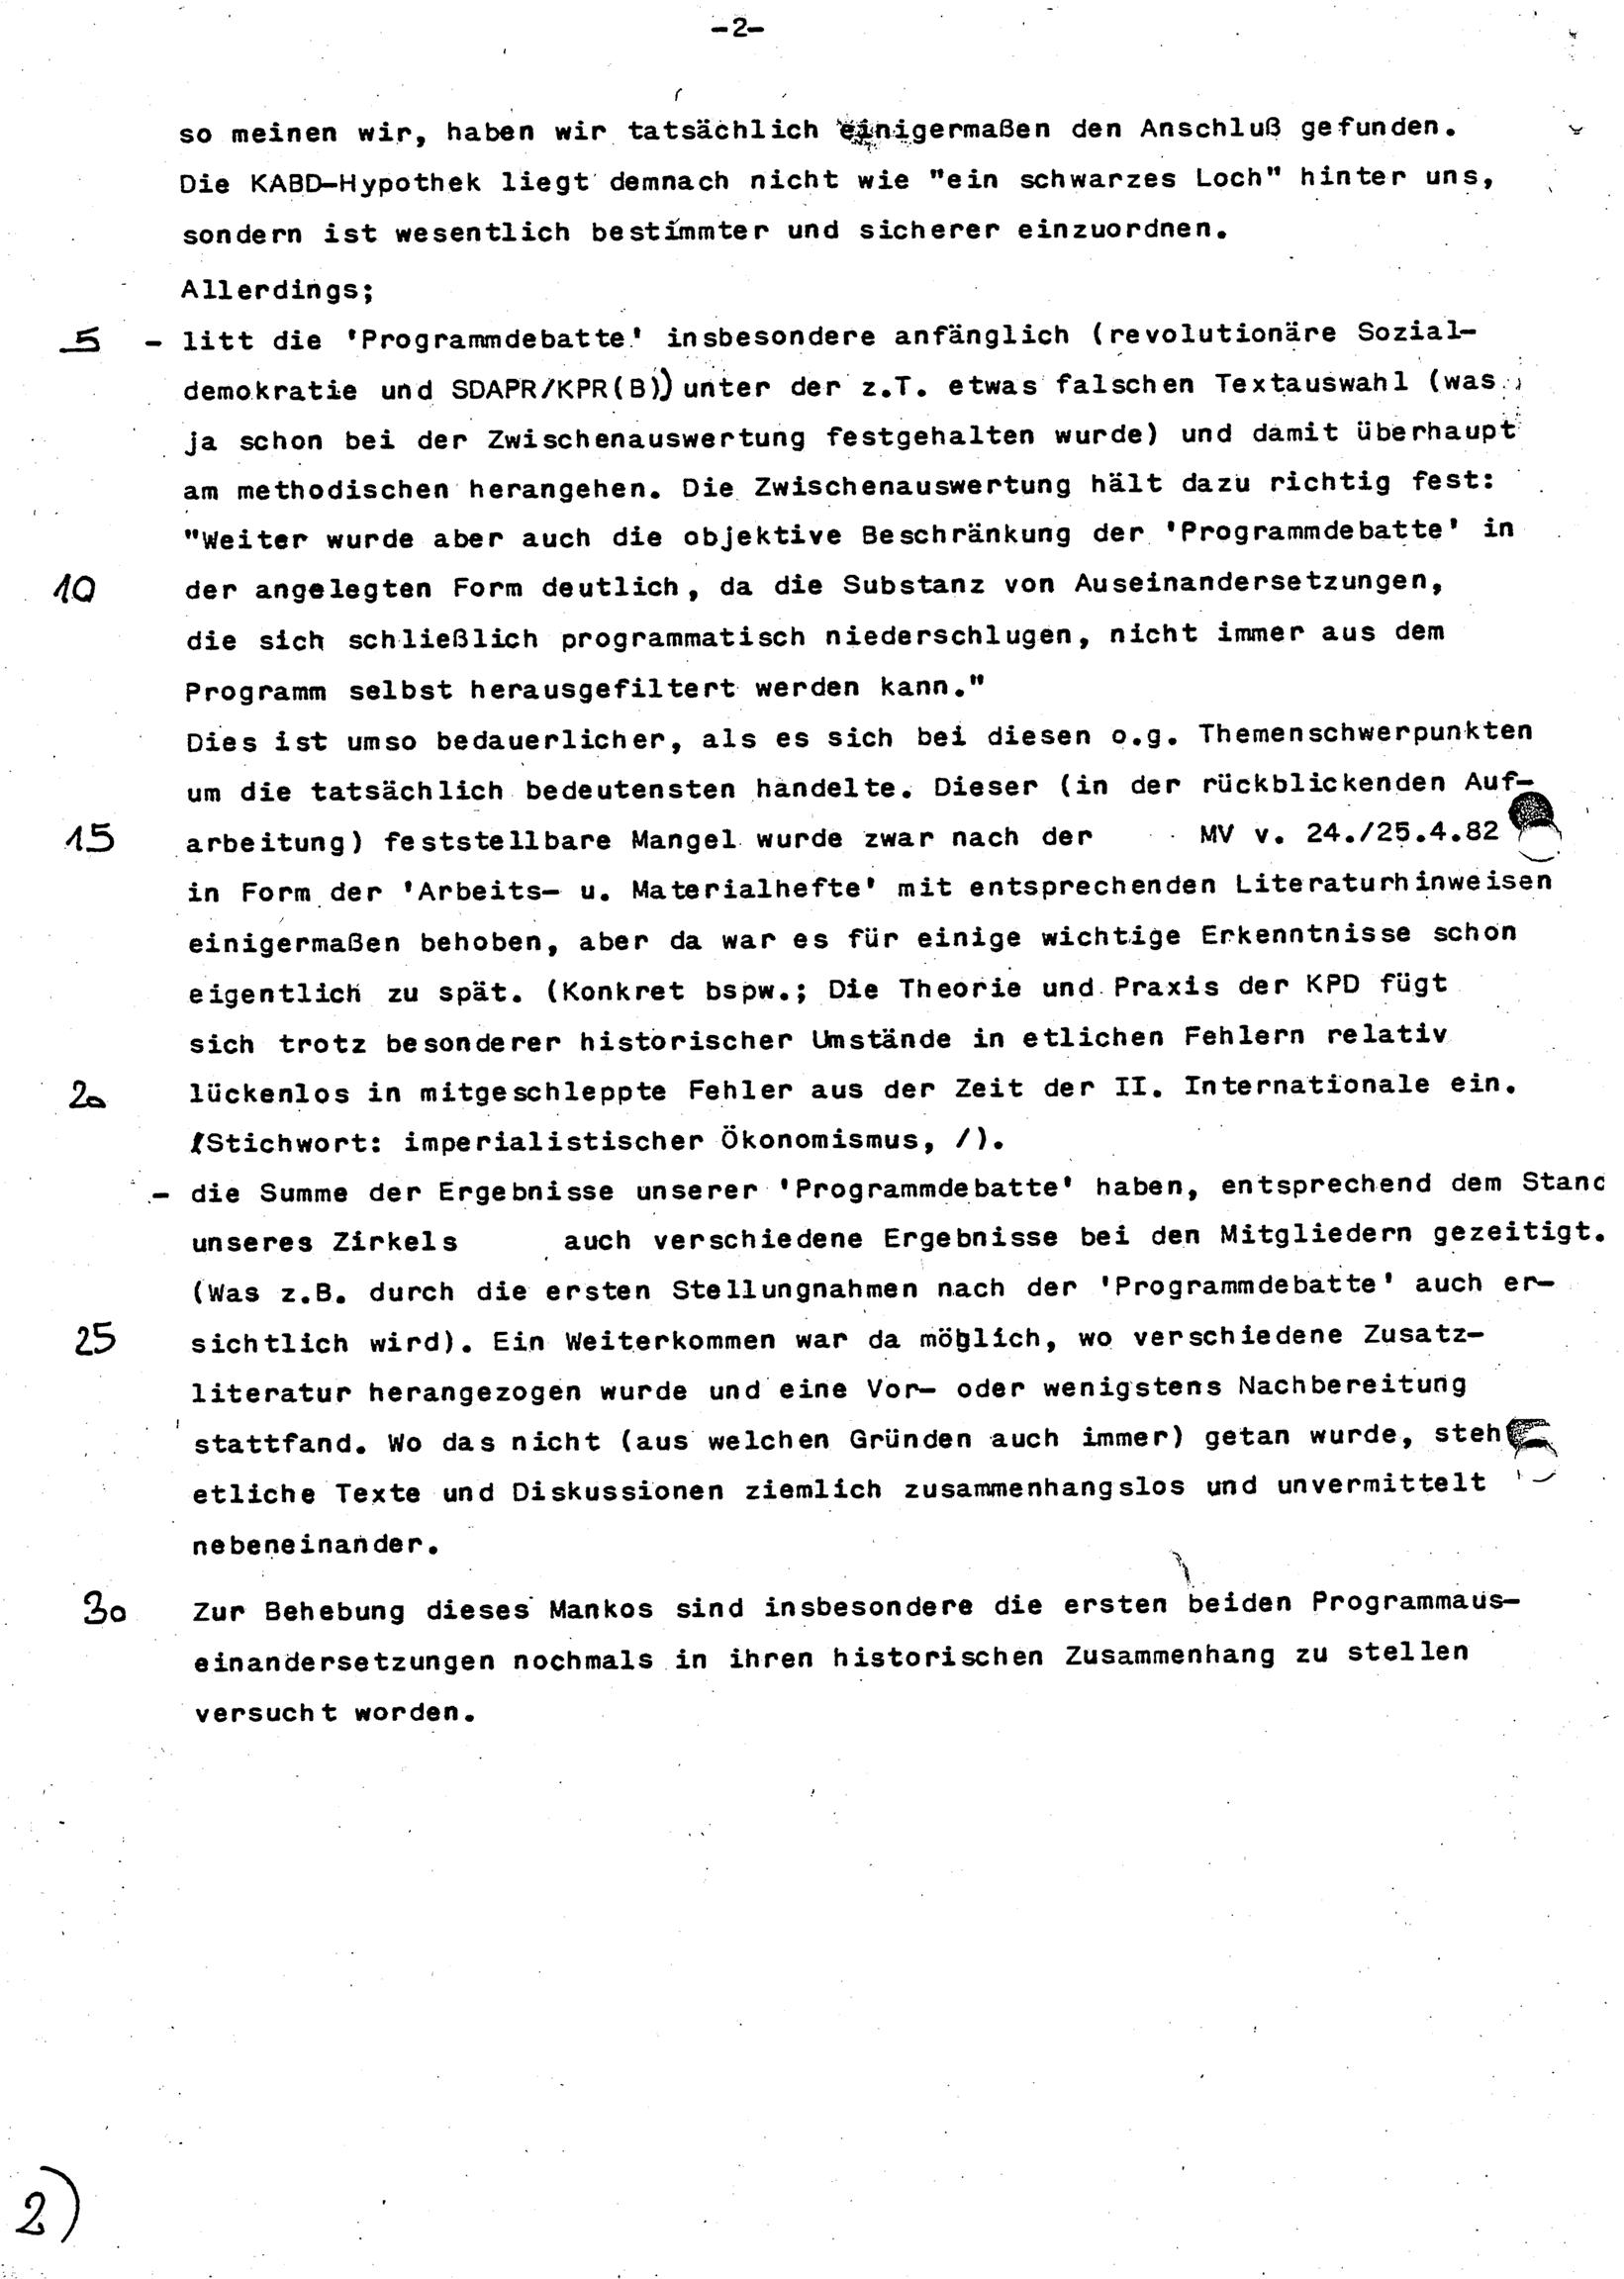 Ulm_KGU_Arbeitsheft_19830425_015_004